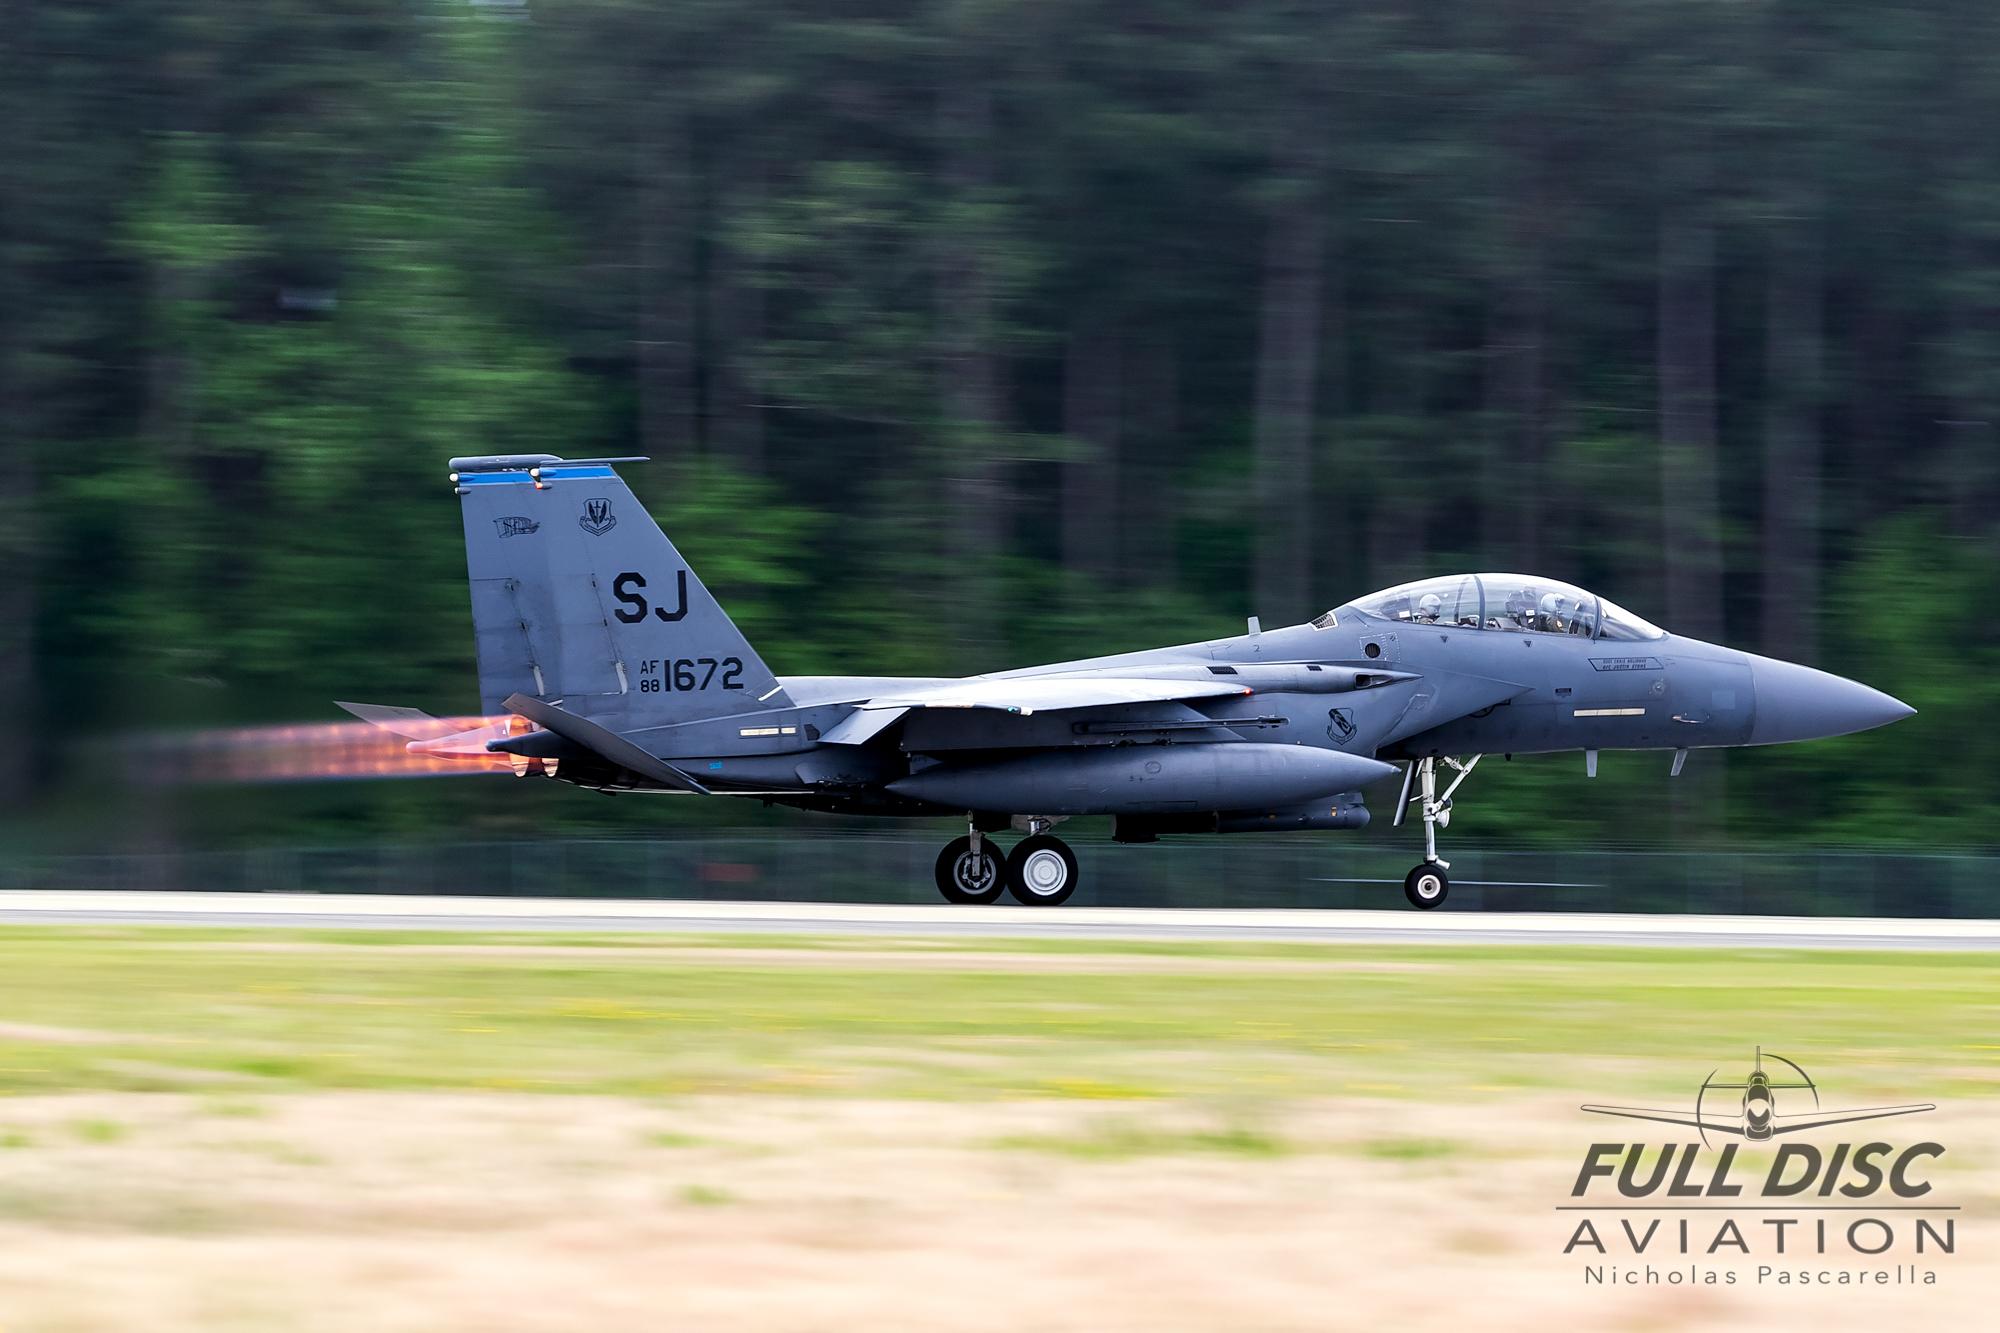 nickpascarella_nicholaspascarella_fulldiscaviation_aircraft_f15_afterburner_takeoff.jpg